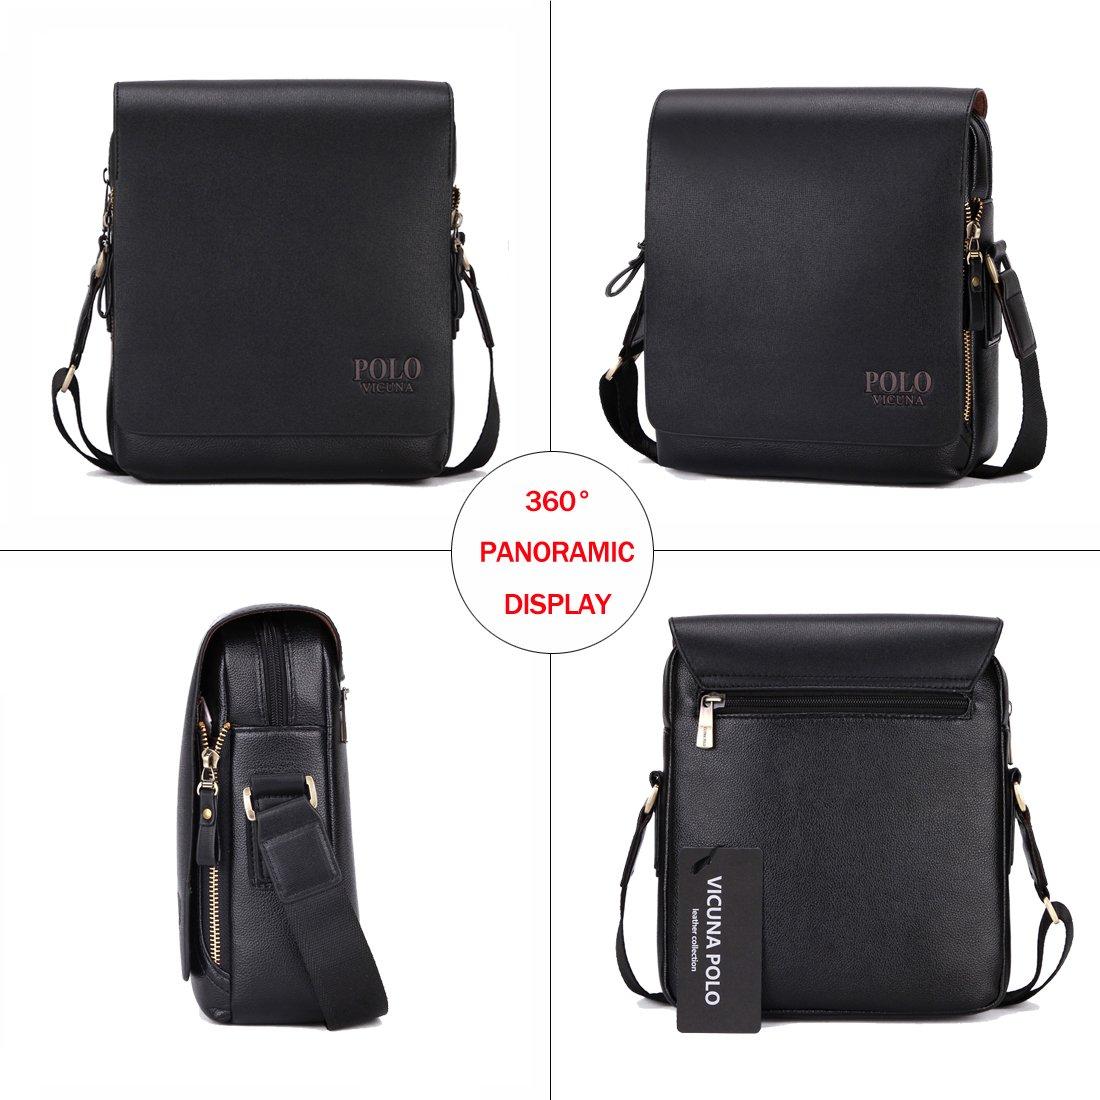 VICUNA POLO PU Leather Men Messenger Bag Cross Body Bag Shoulder Bag For Men (large, black)  Amazon.in  Bags, Wallets   Luggage 80990815bd